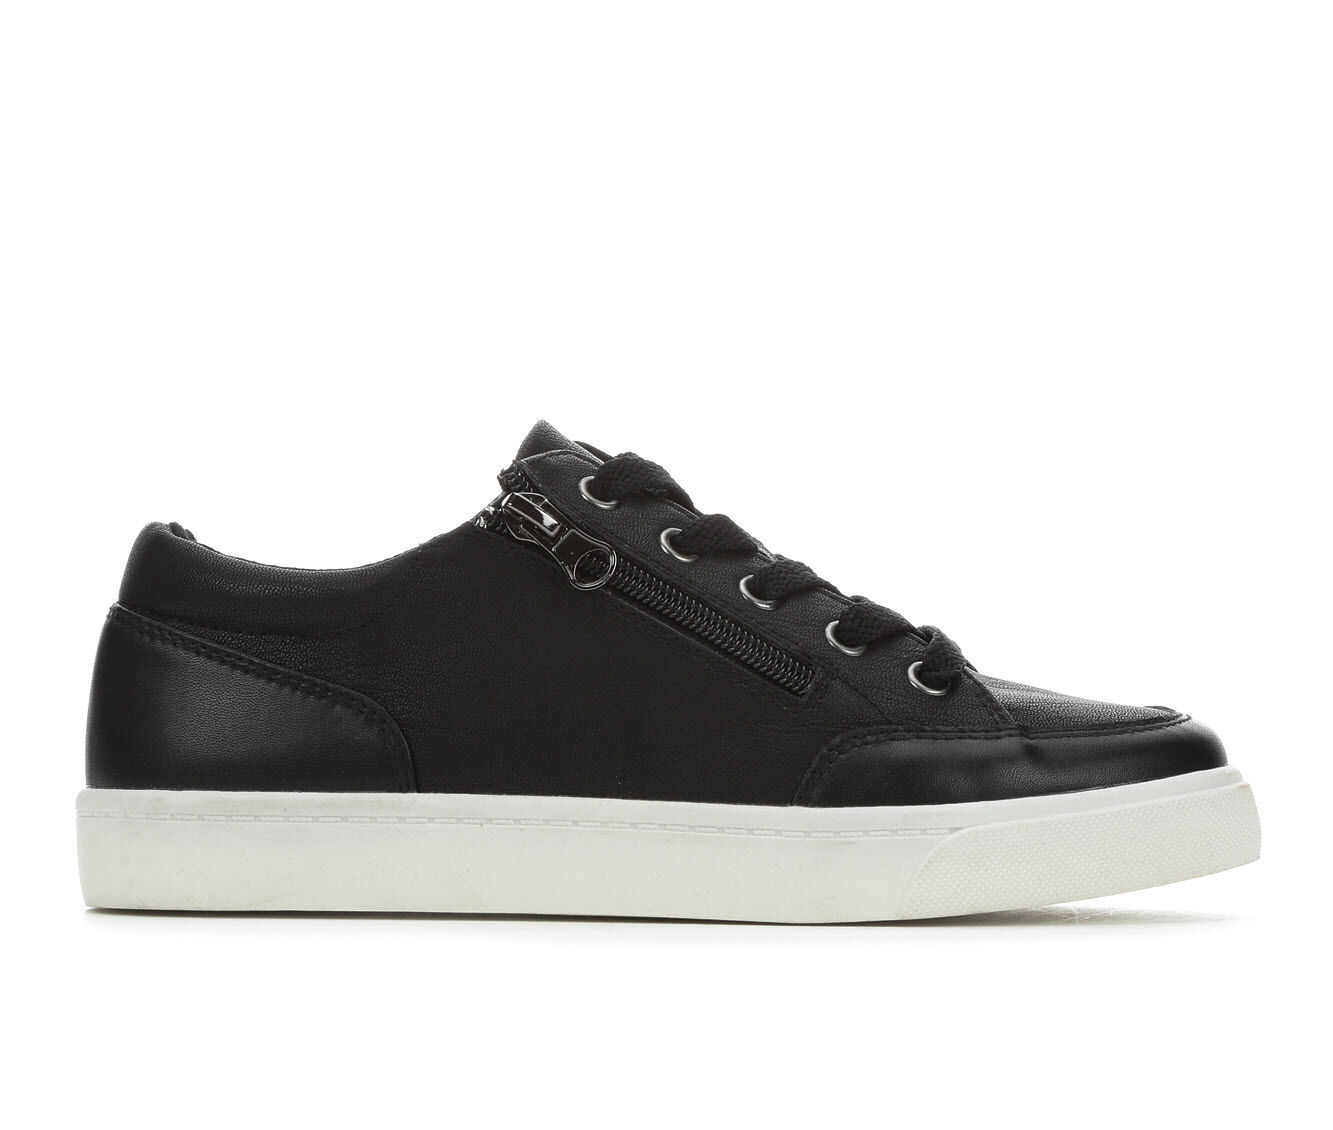 uk shoes_kd4552